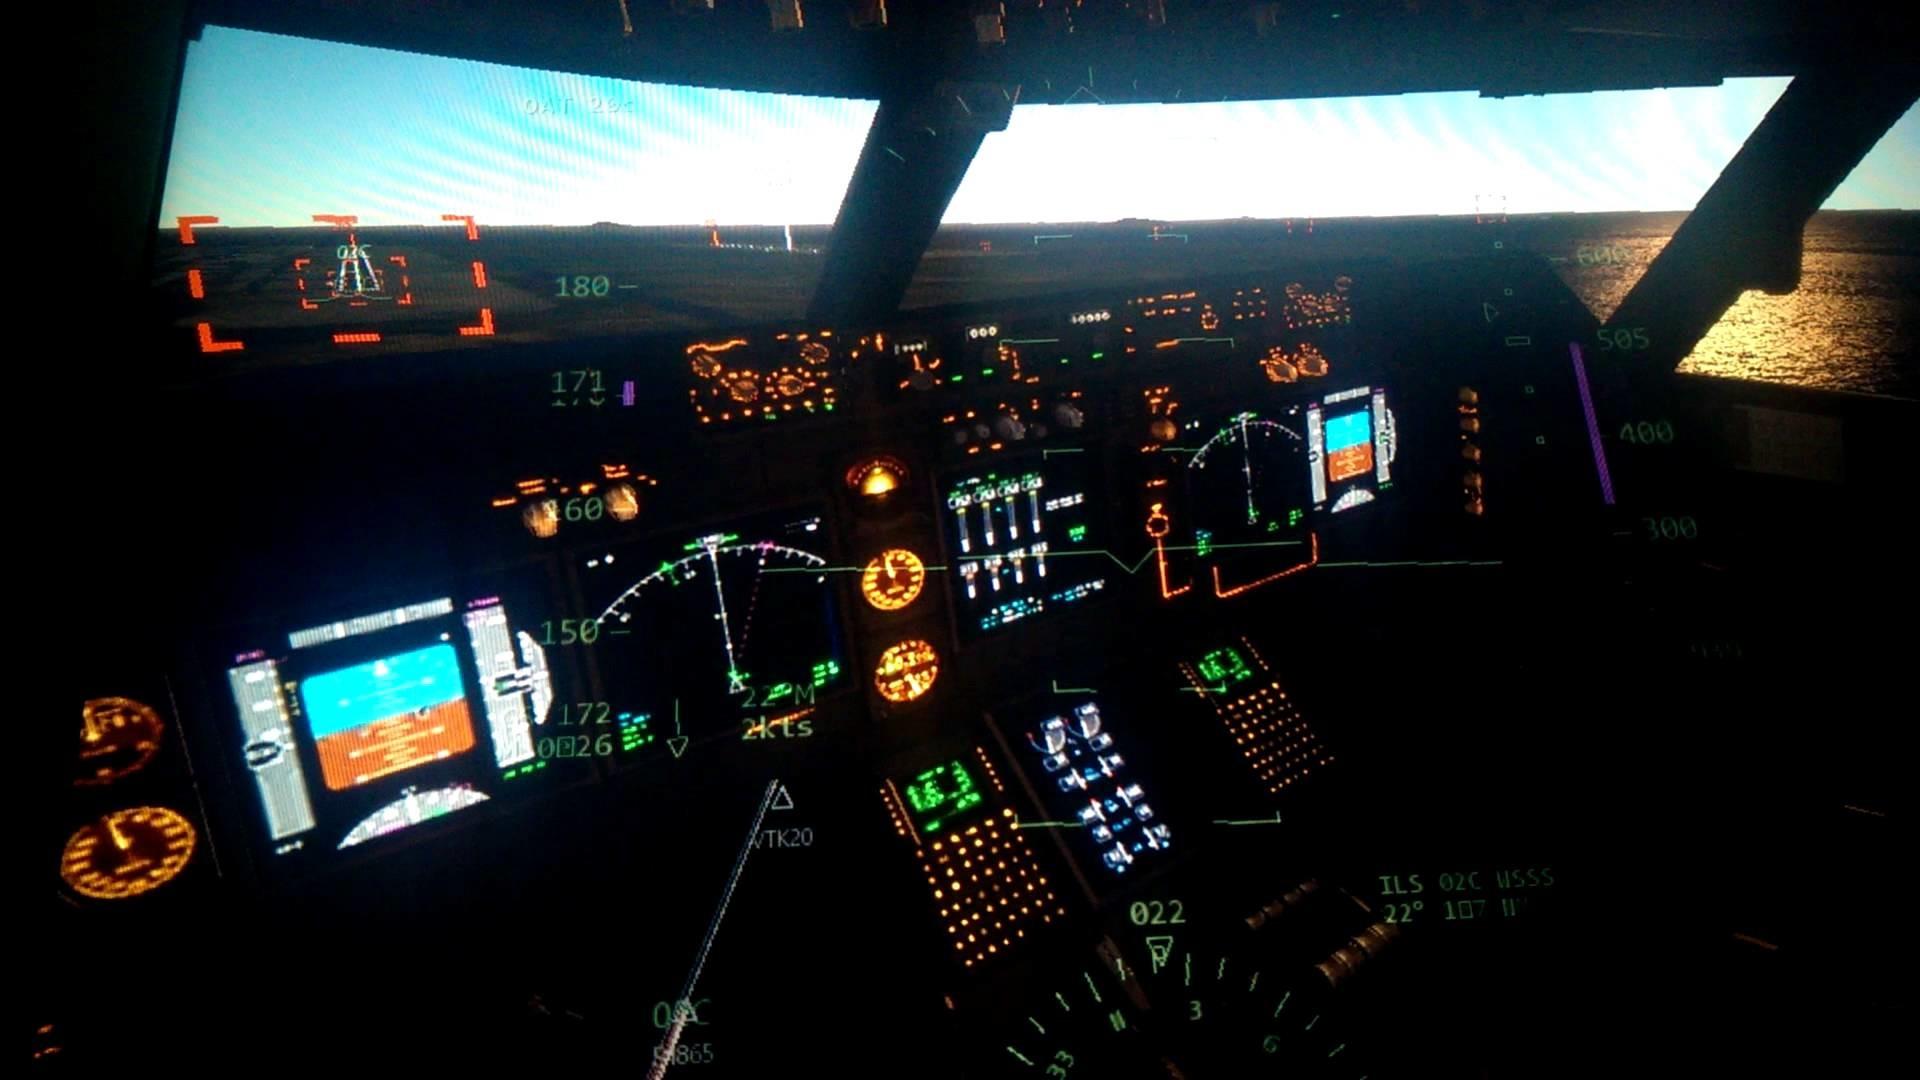 Klm Boeing 747 400f Cockpit Hong Kong Take Off At Sunrise Ipad